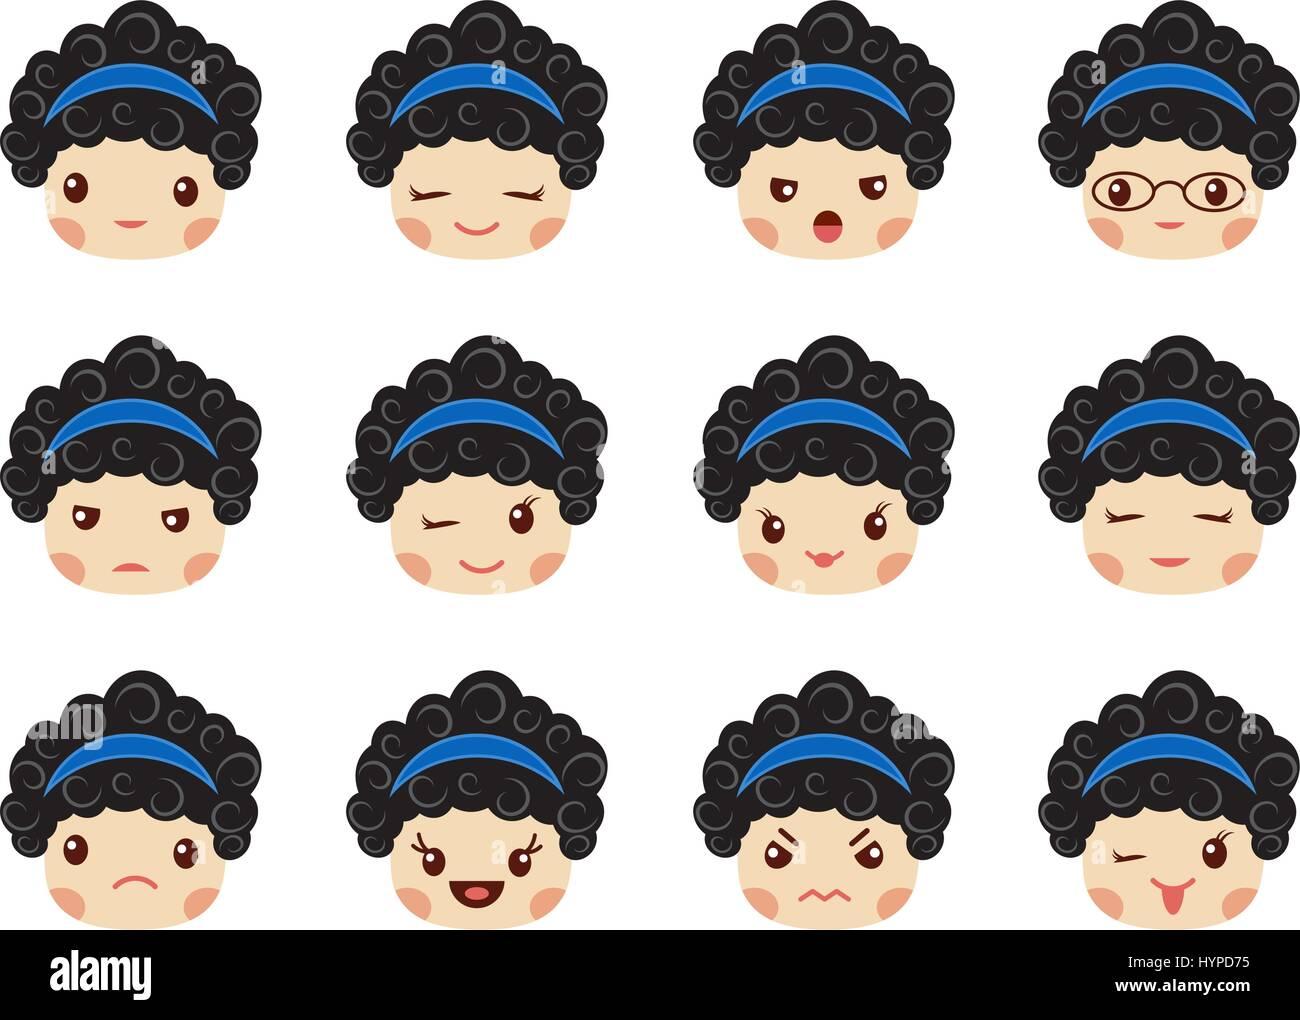 Emoji set of girls, avatar collection - Stock Image